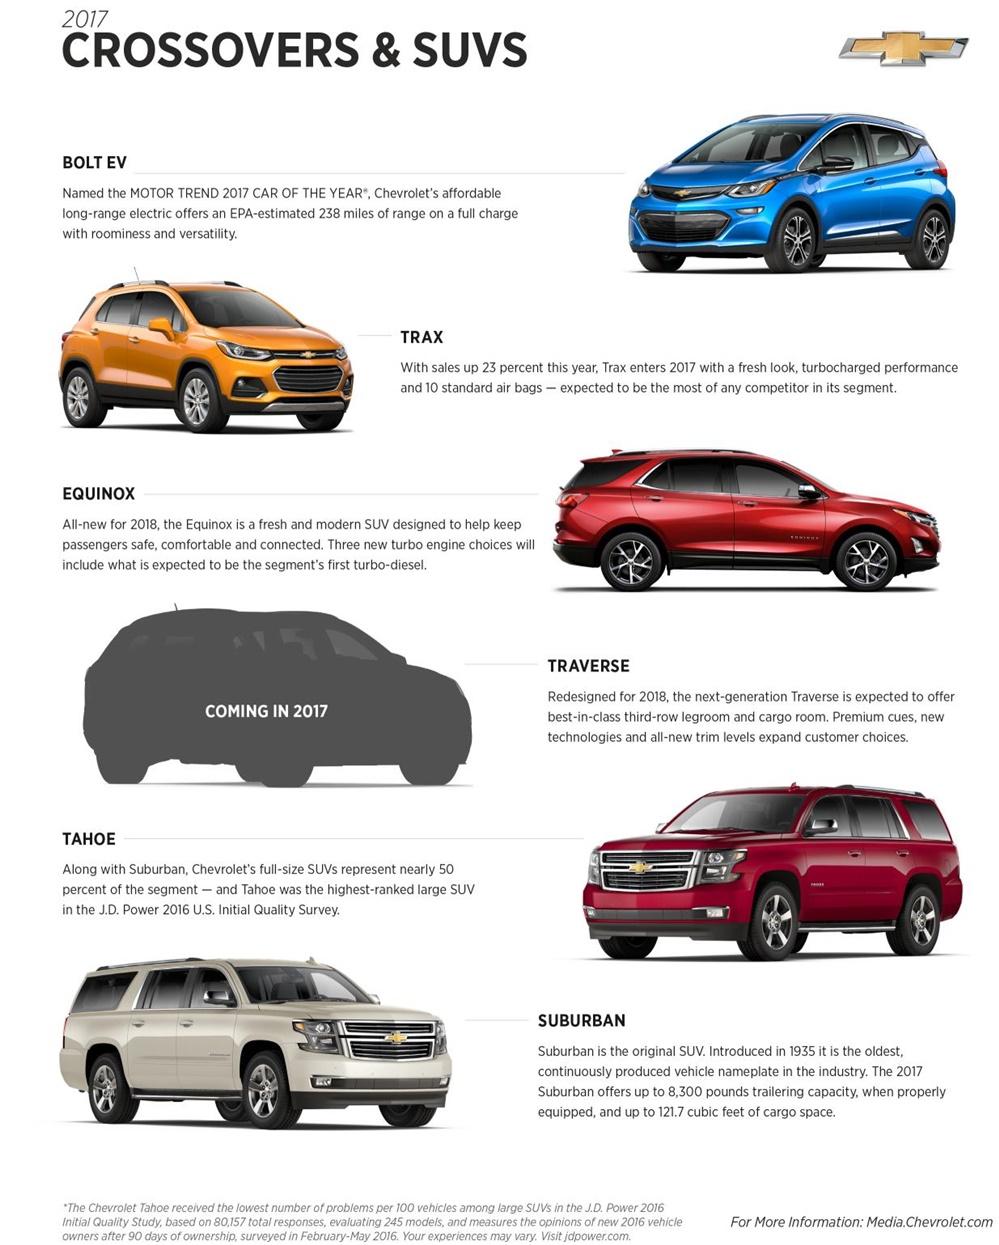 2017 Chevrolet Crossover SUVs at 2018 Chevrolet Traverse to Debut at NAIAS